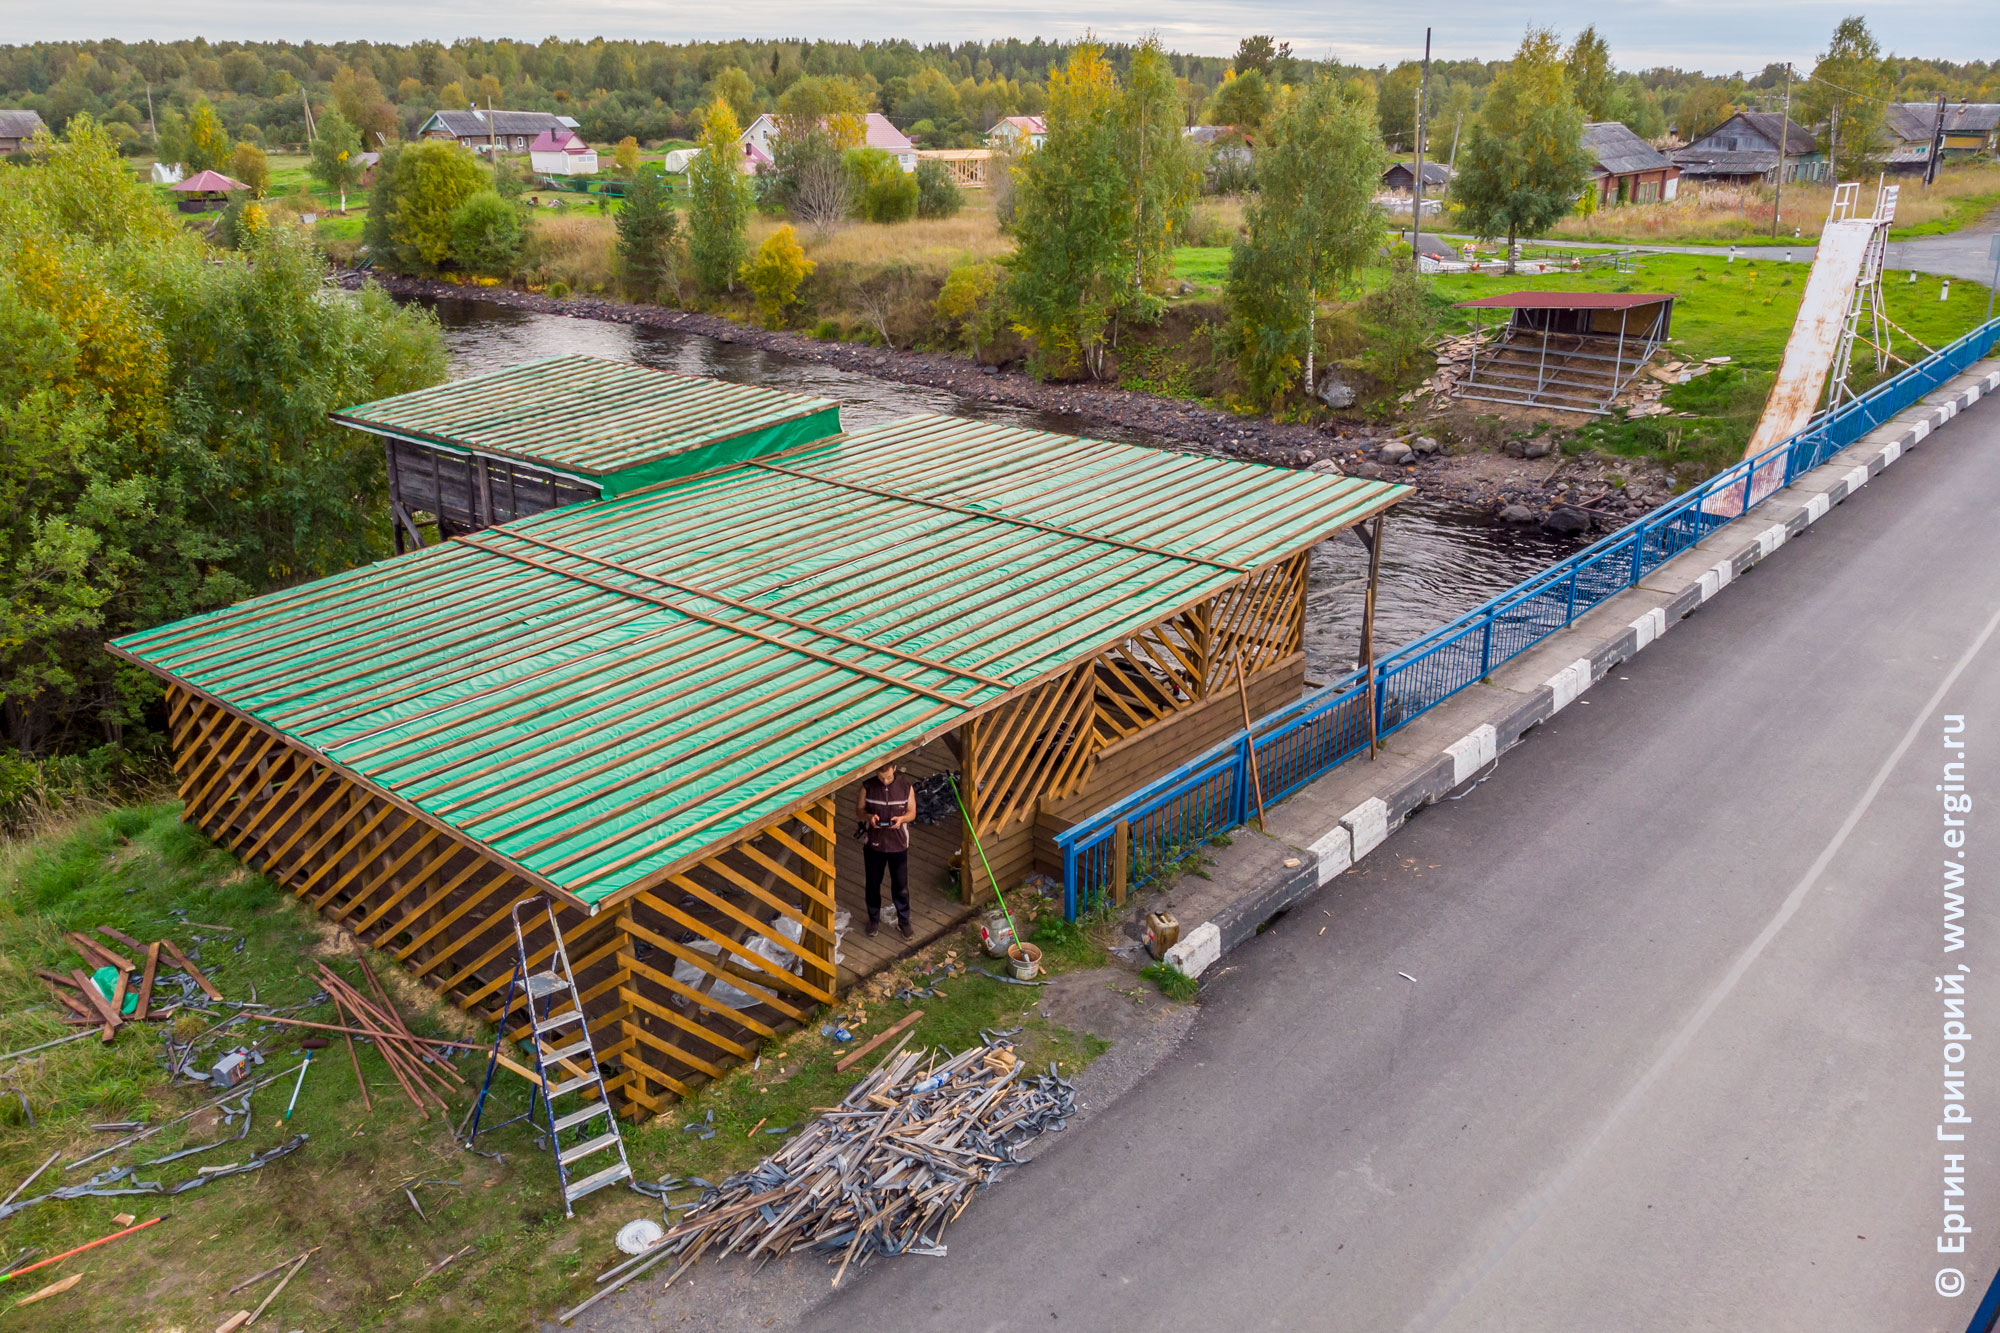 Берег реки Тивдийки с отремонтированными строениями для соревнований по фристайл-каякингу